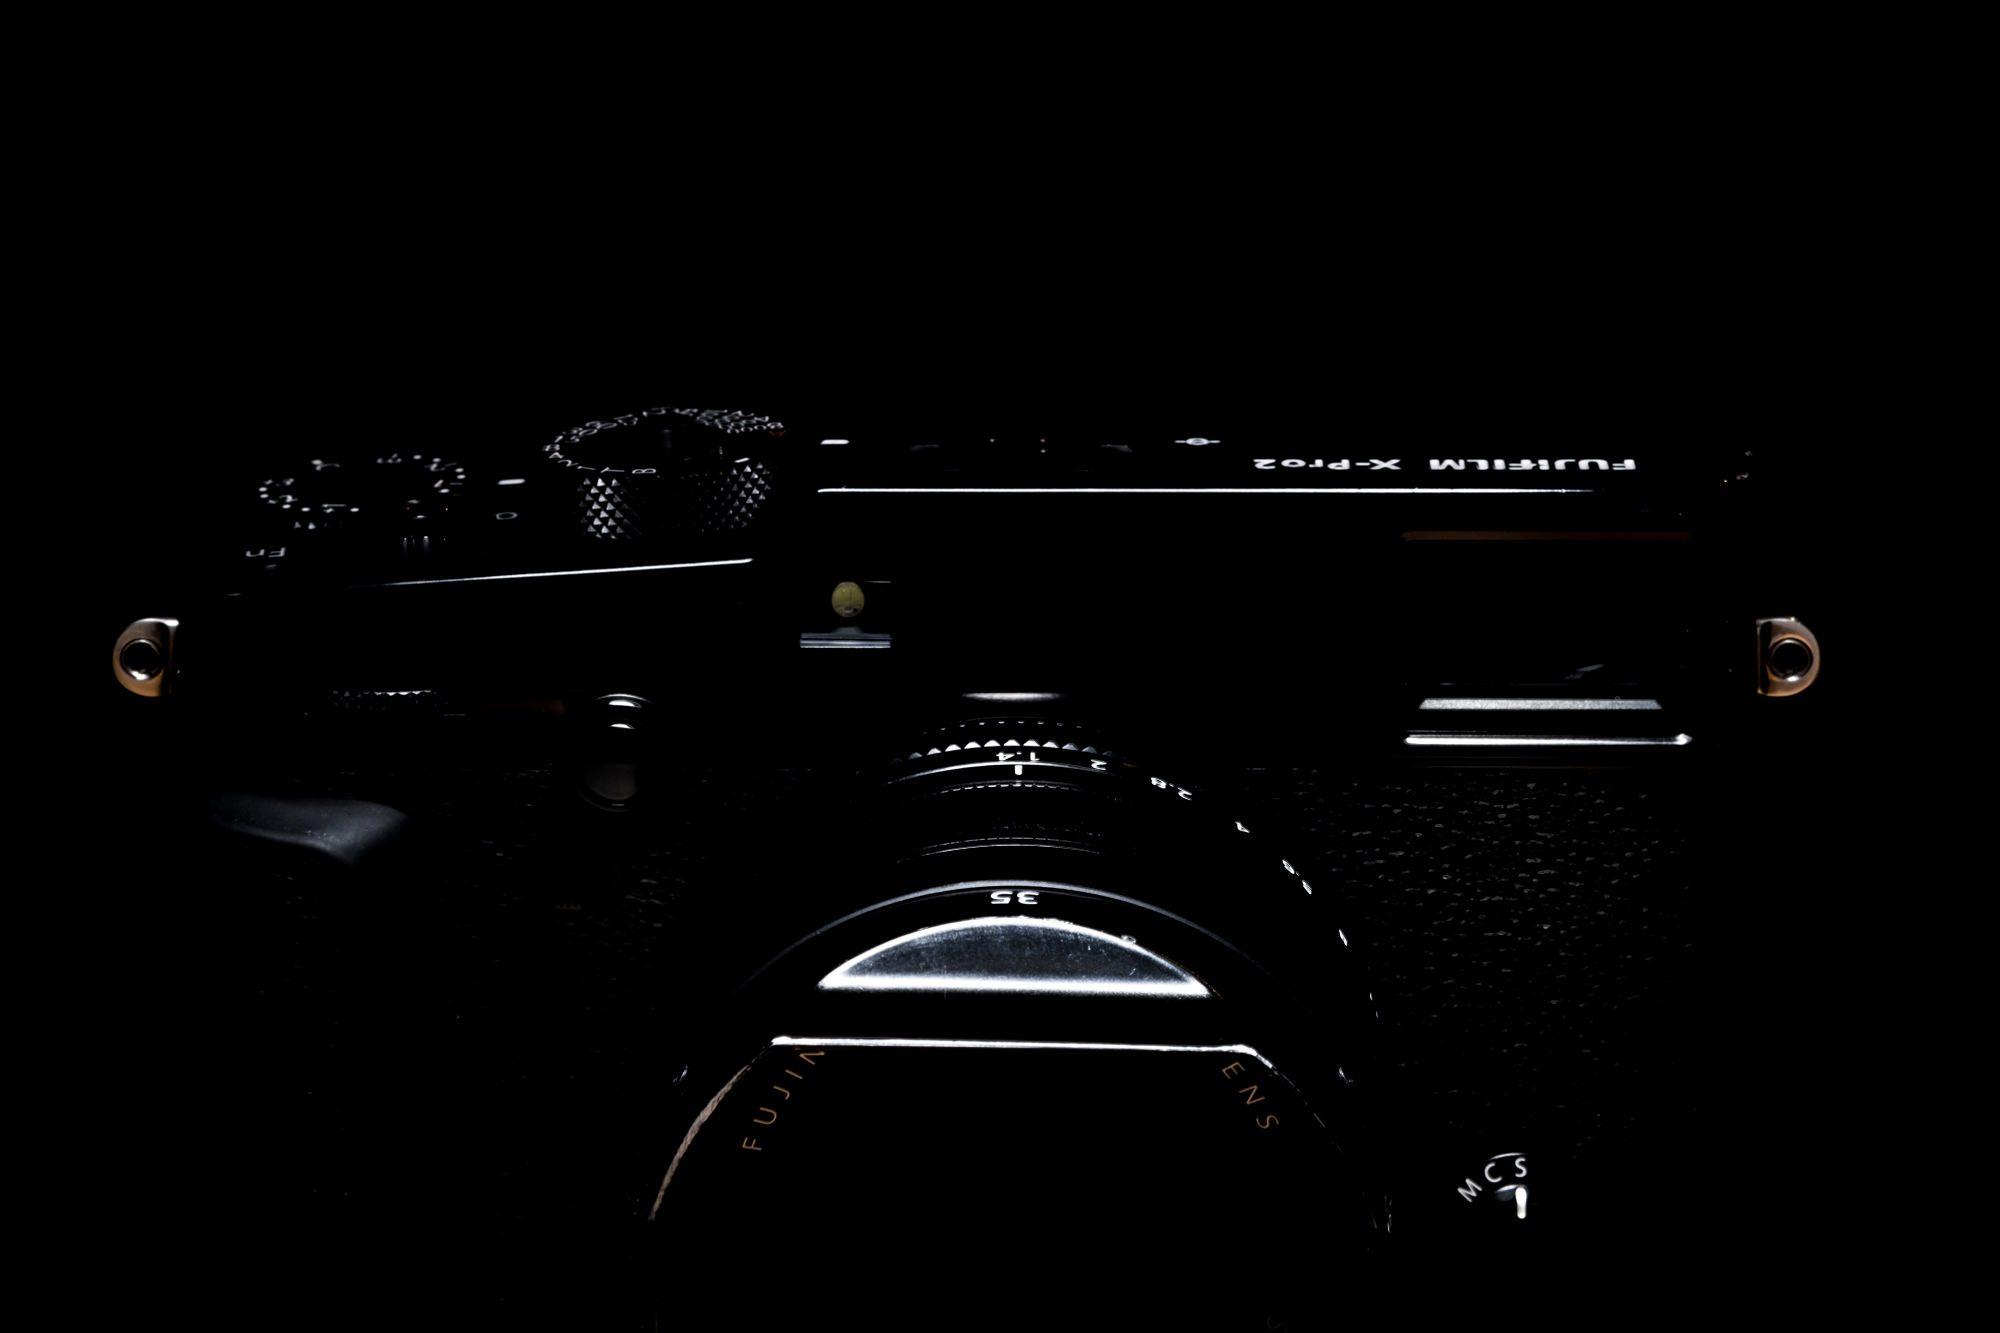 A Little Bit of Magic – Fuji's XF 35mm F/1.4